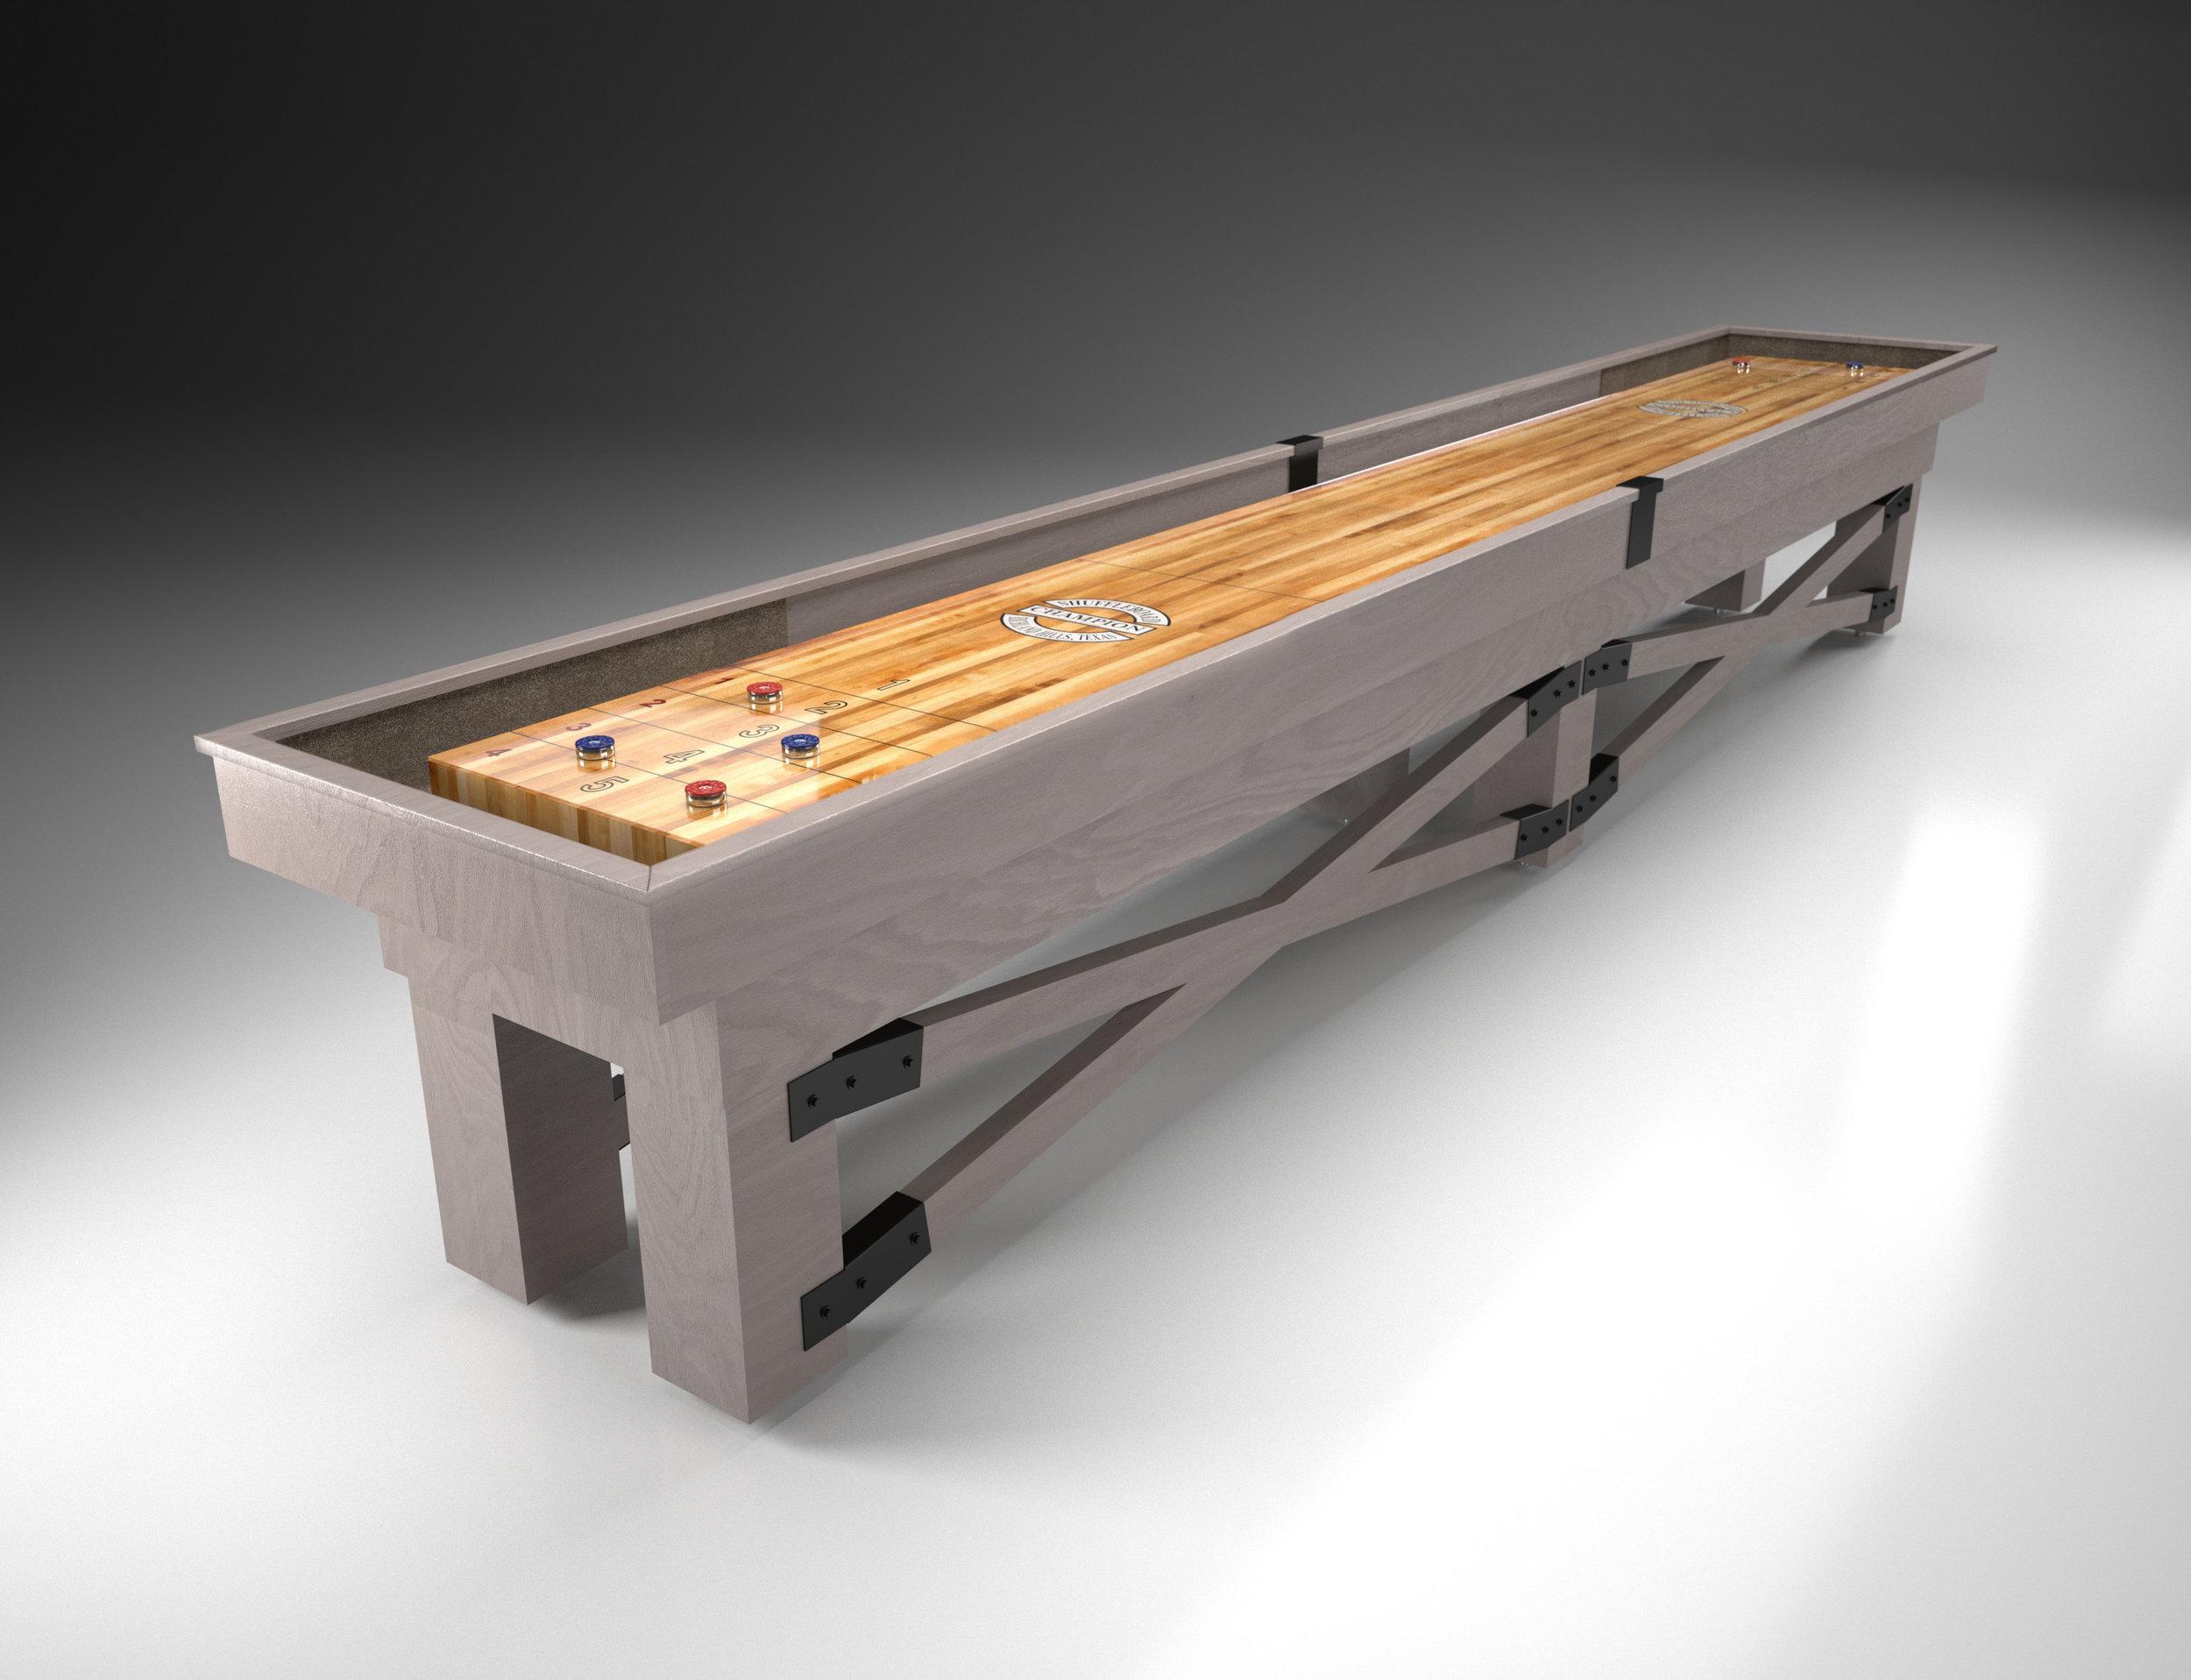 Champion Rustic Shuffleboard in rustic grey on oak